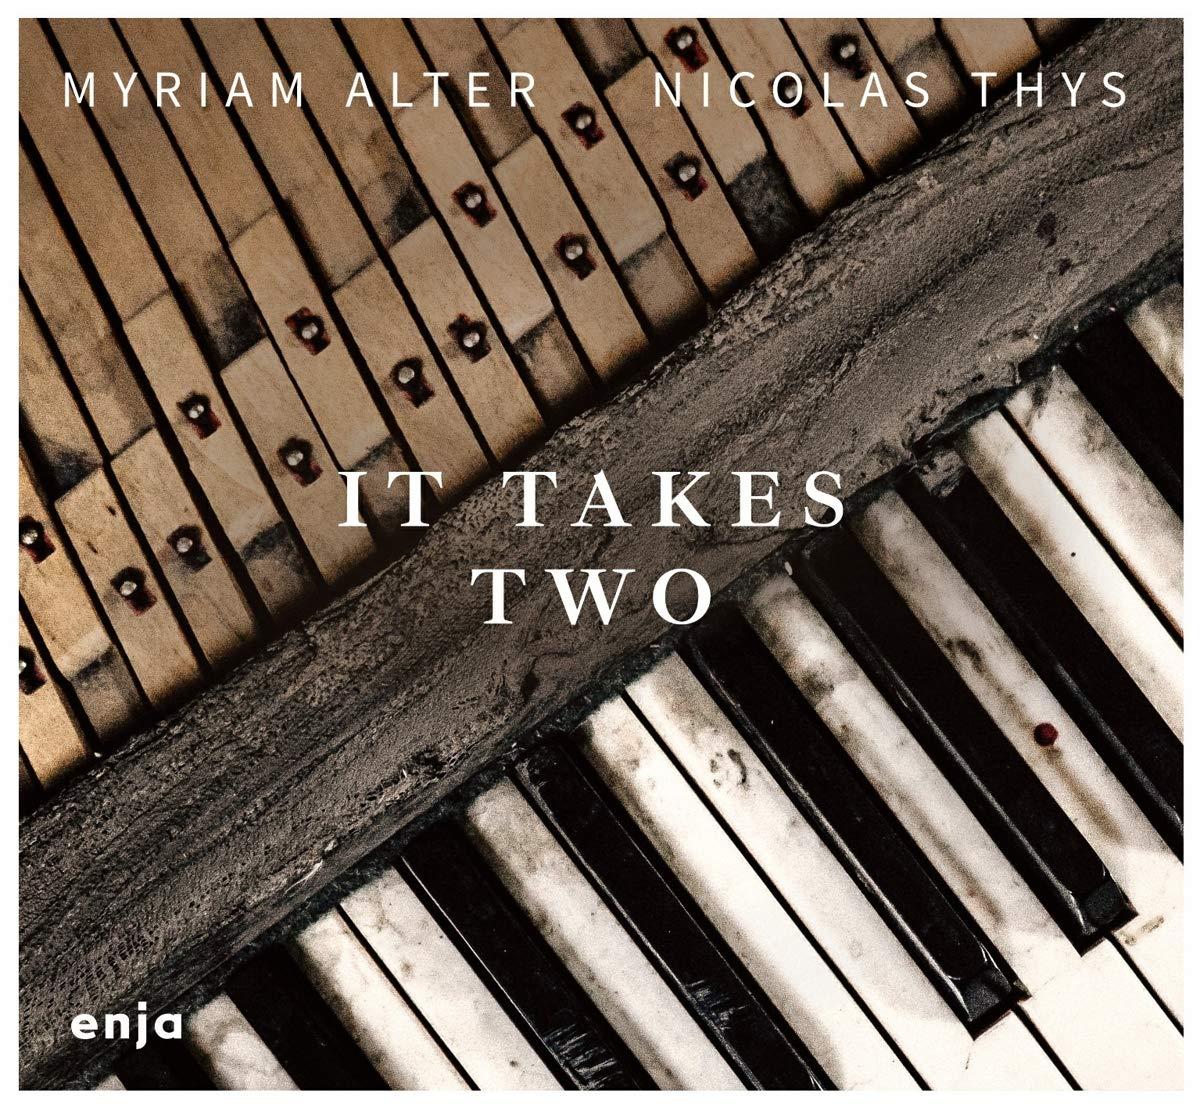 MYRIAM ALTER - Myriam Alter / Nicolas Thys : It Takes Two cover